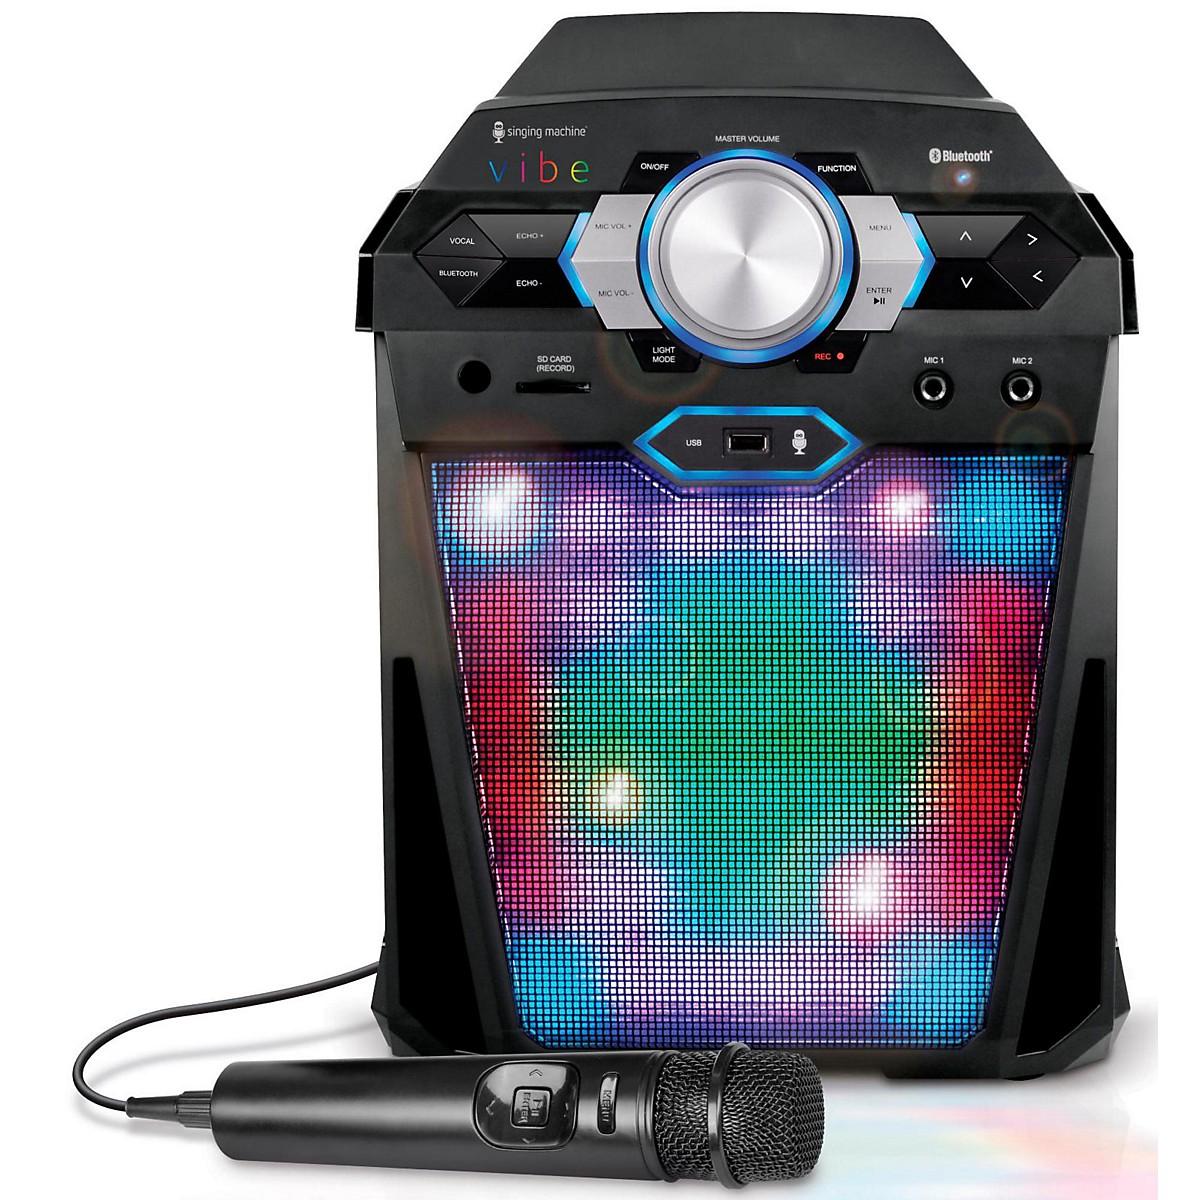 The Singing Machine VIBE Hi-Def Digital Karaoke System